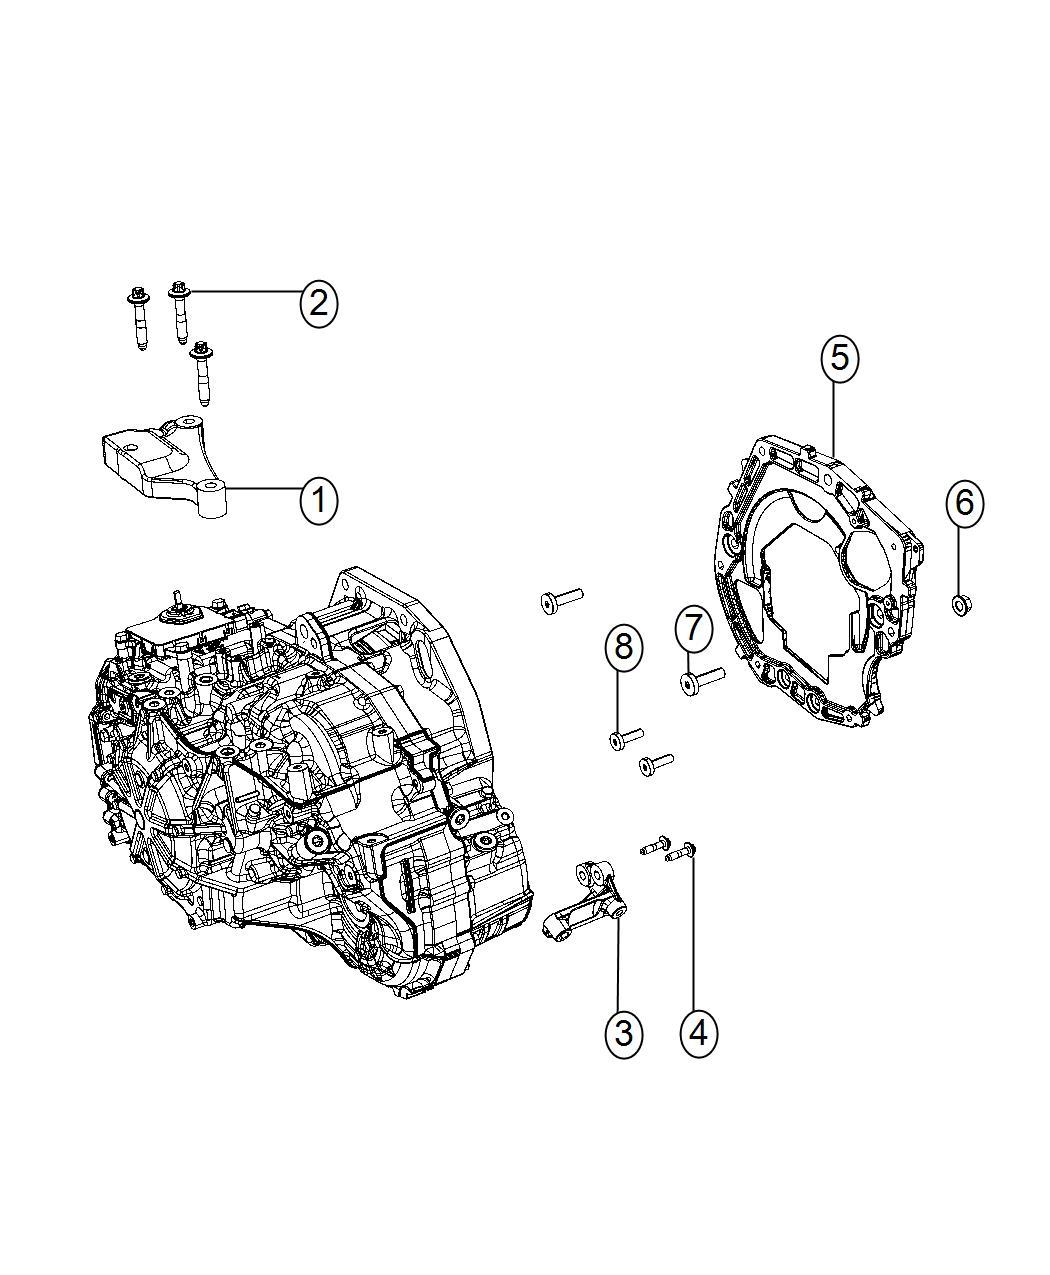 Fiat 500 Adapter. Transmission. Support, mounting, mopar